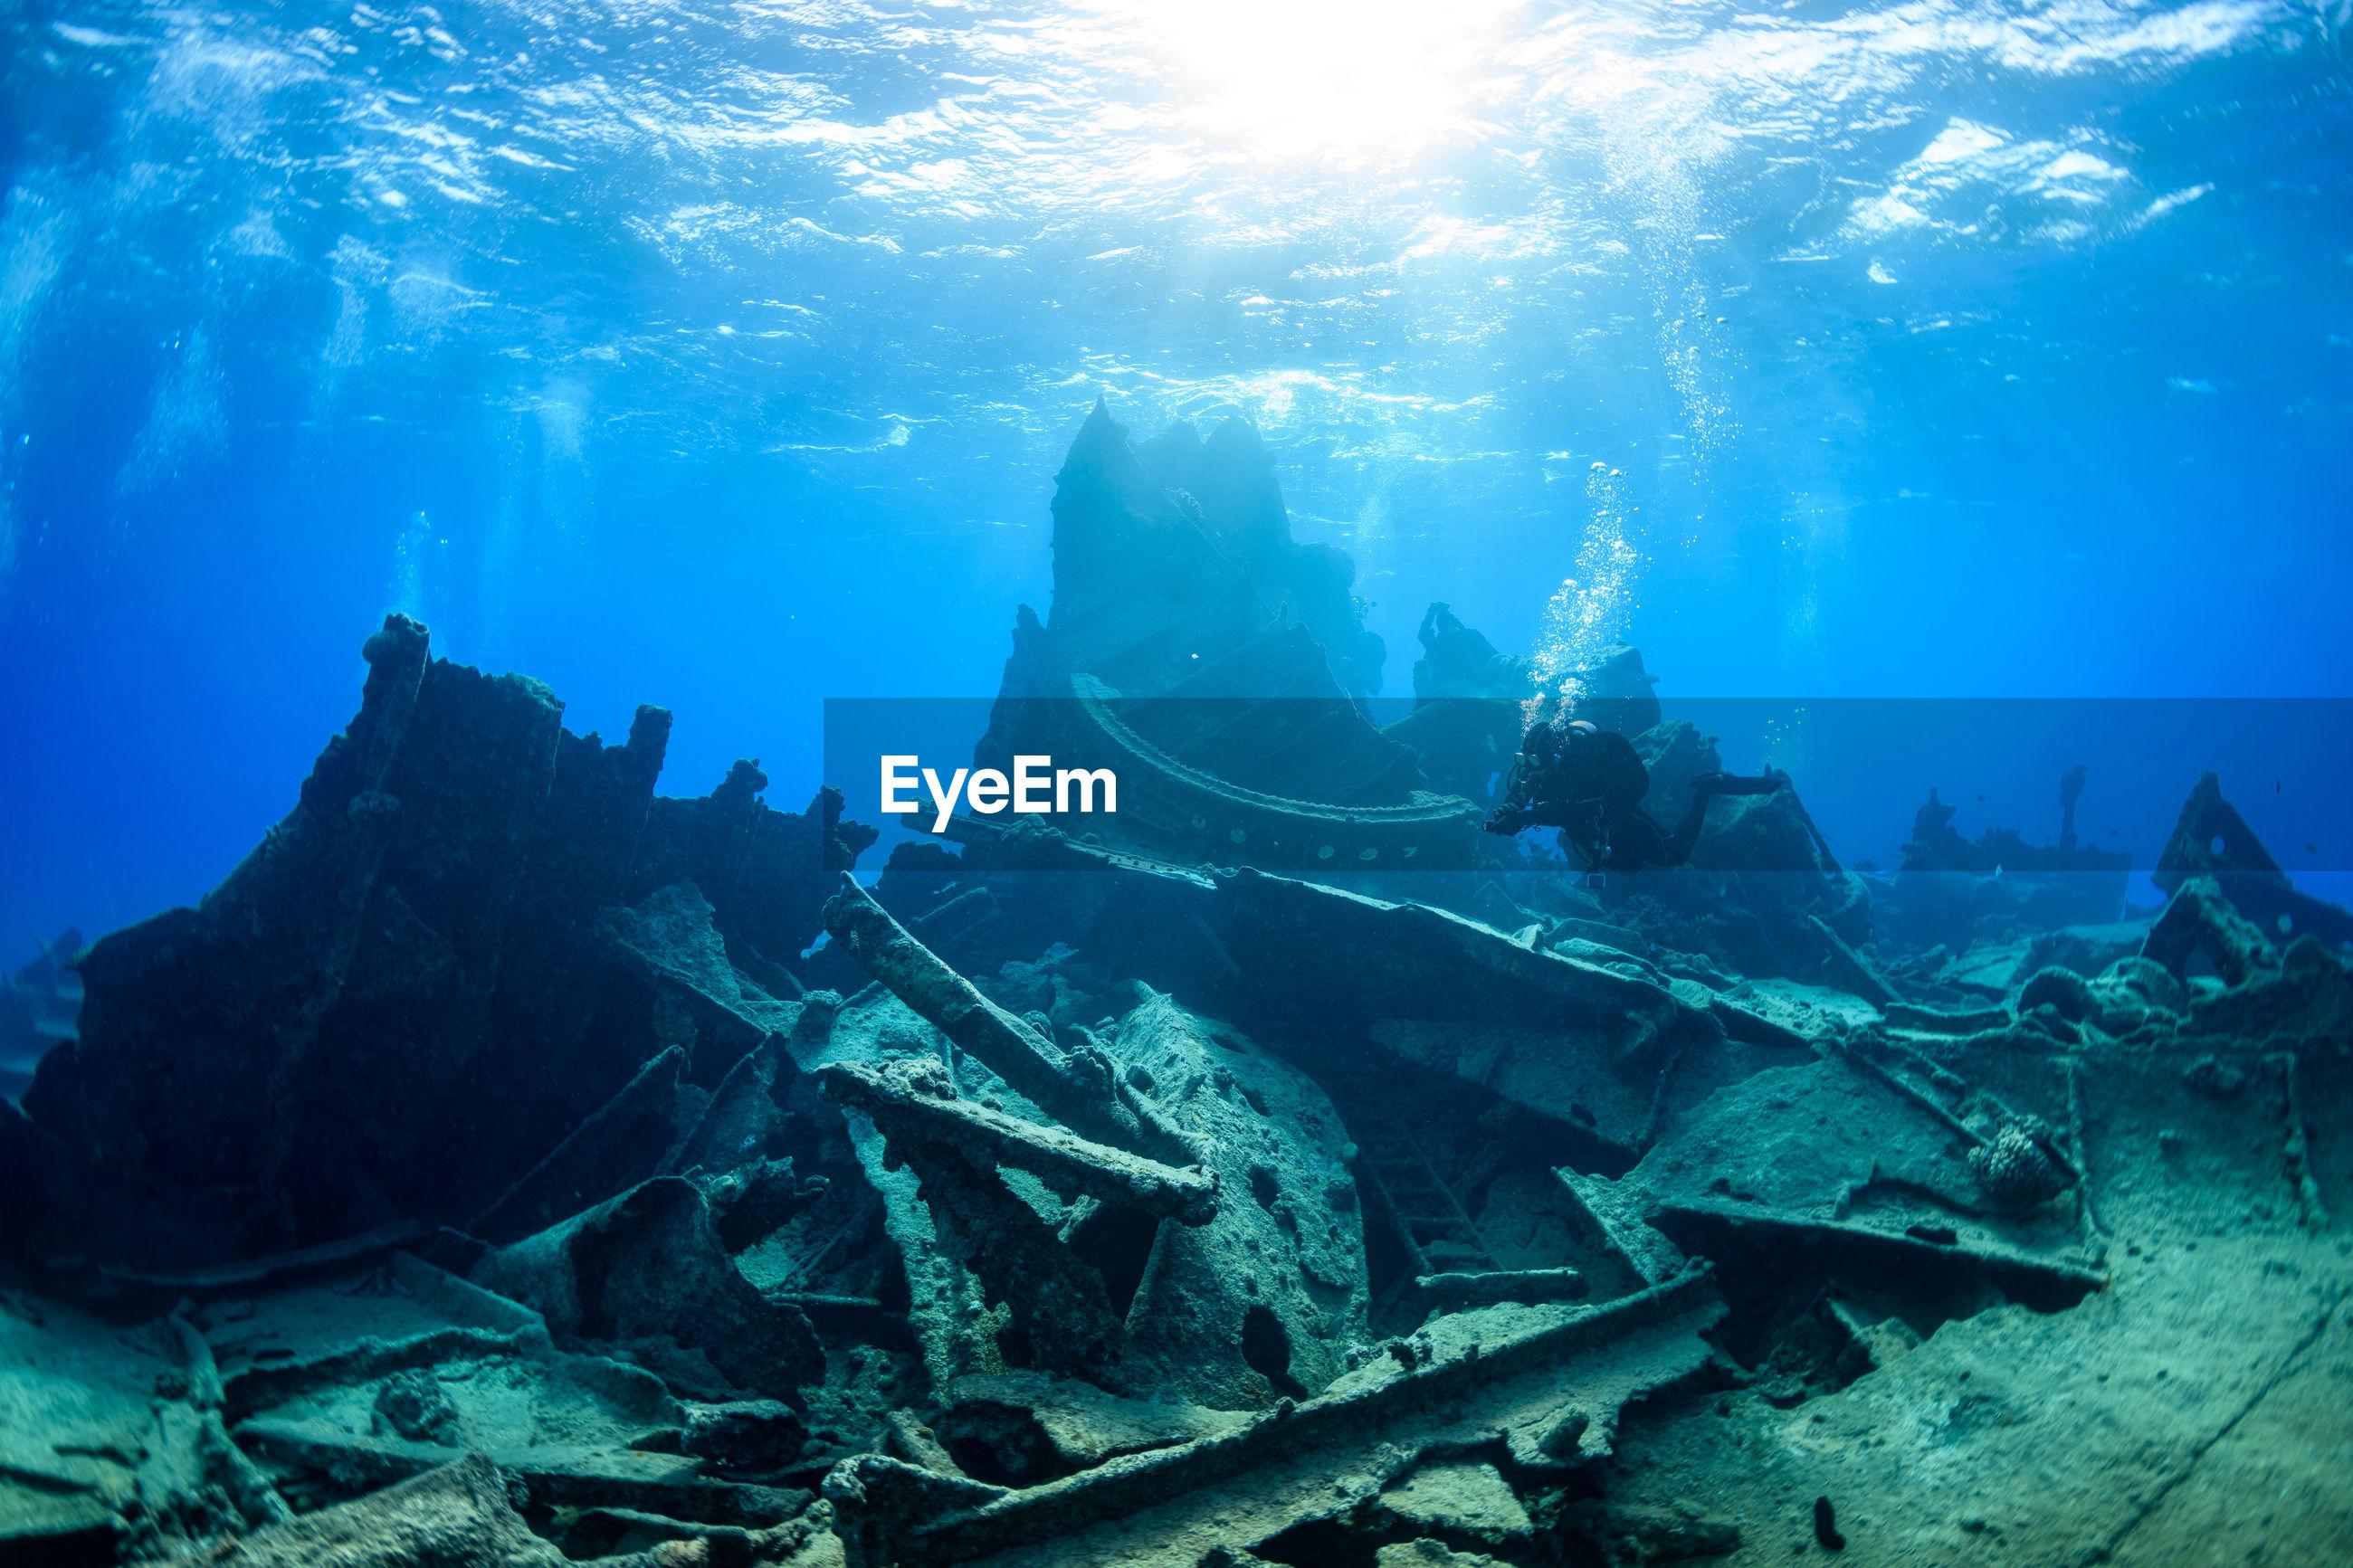 Woman scuba diving by shipwreck in sea